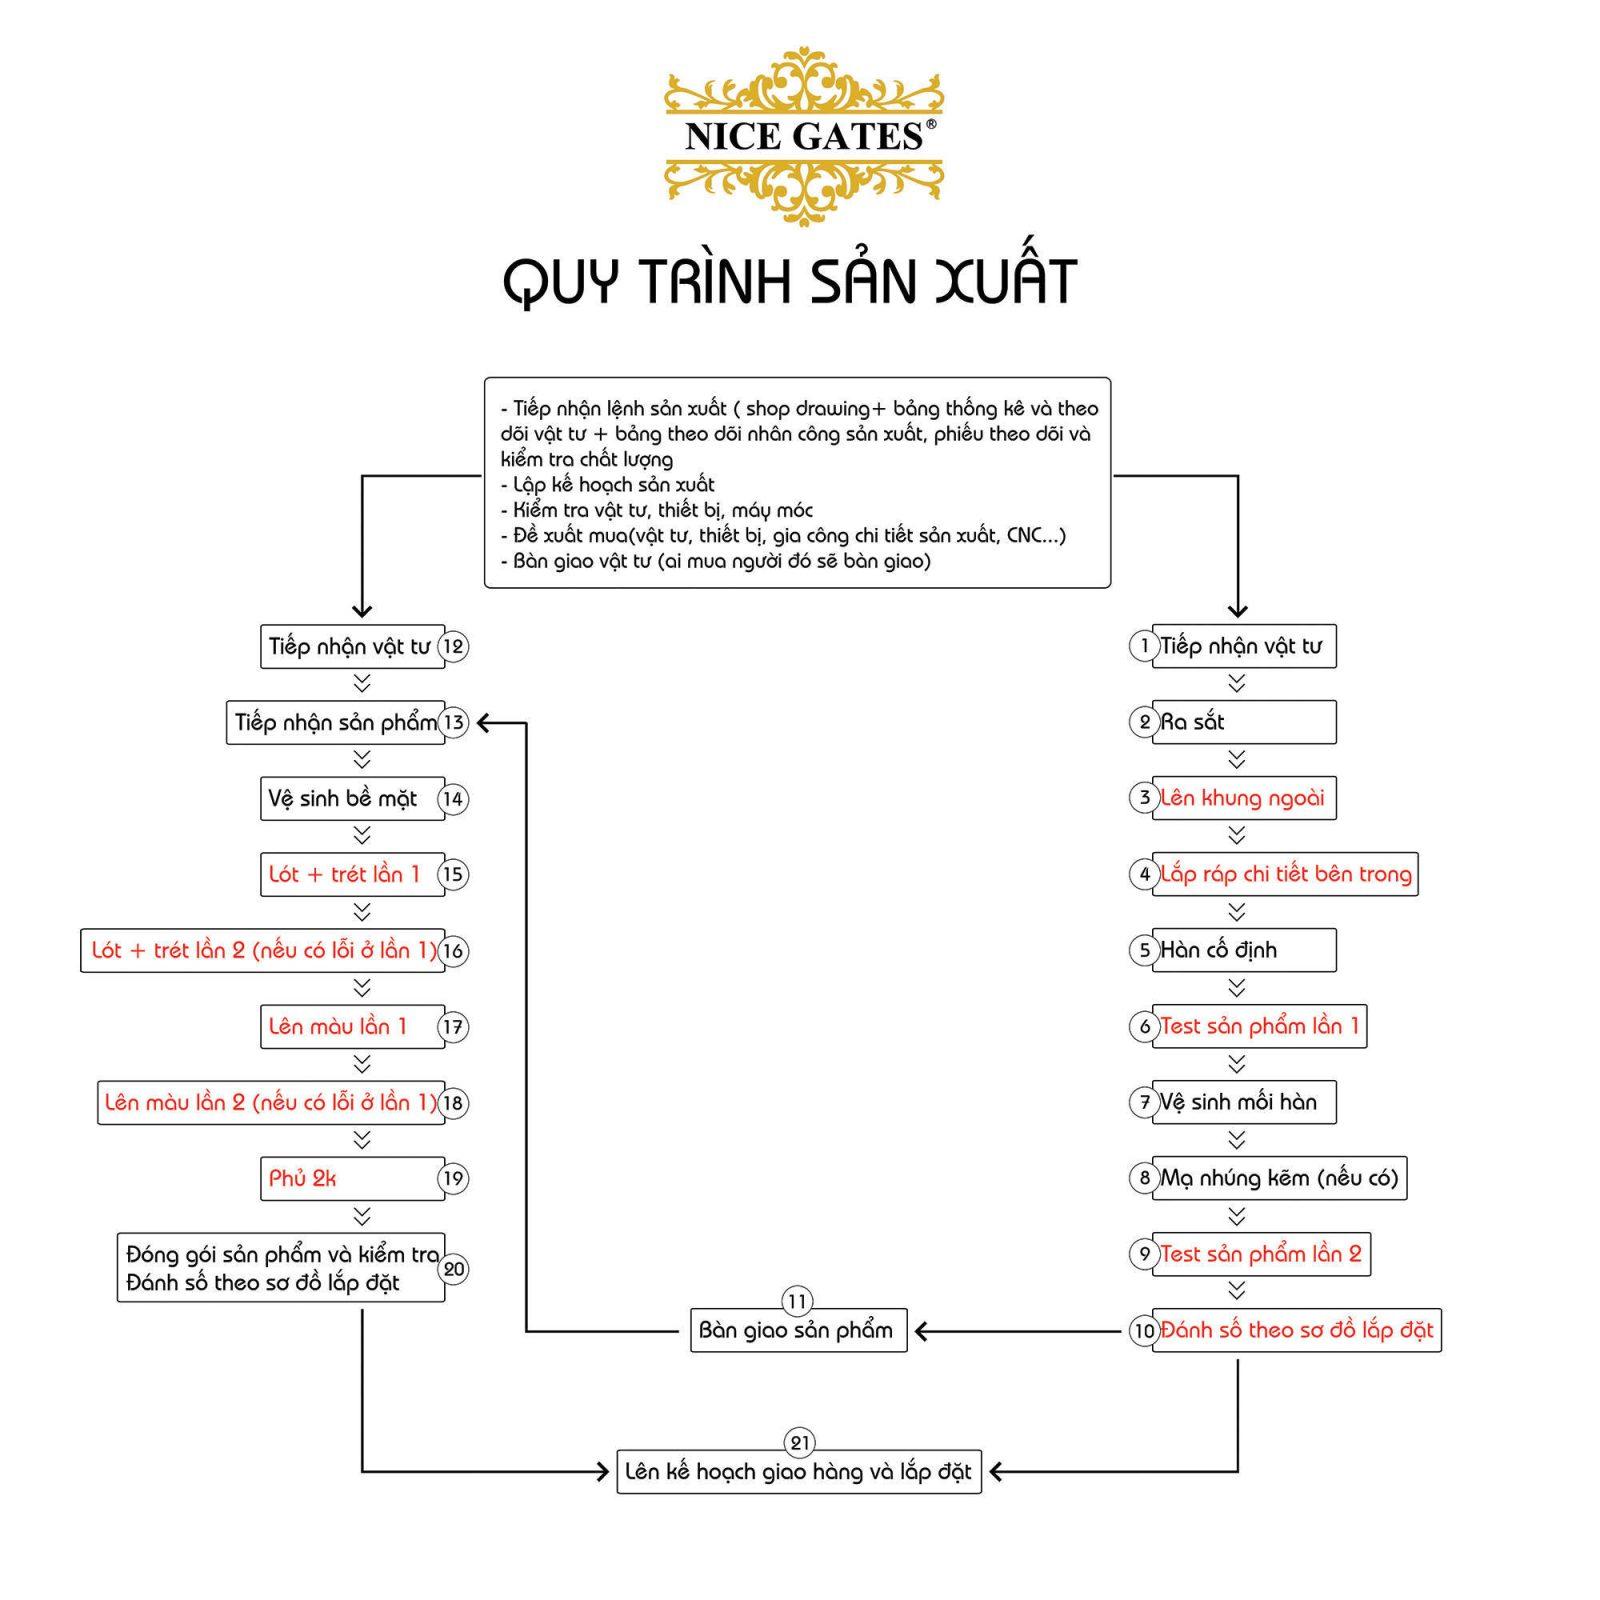 QUY-TRINH-SAN-XUAT-NICE-GATES-GROUP